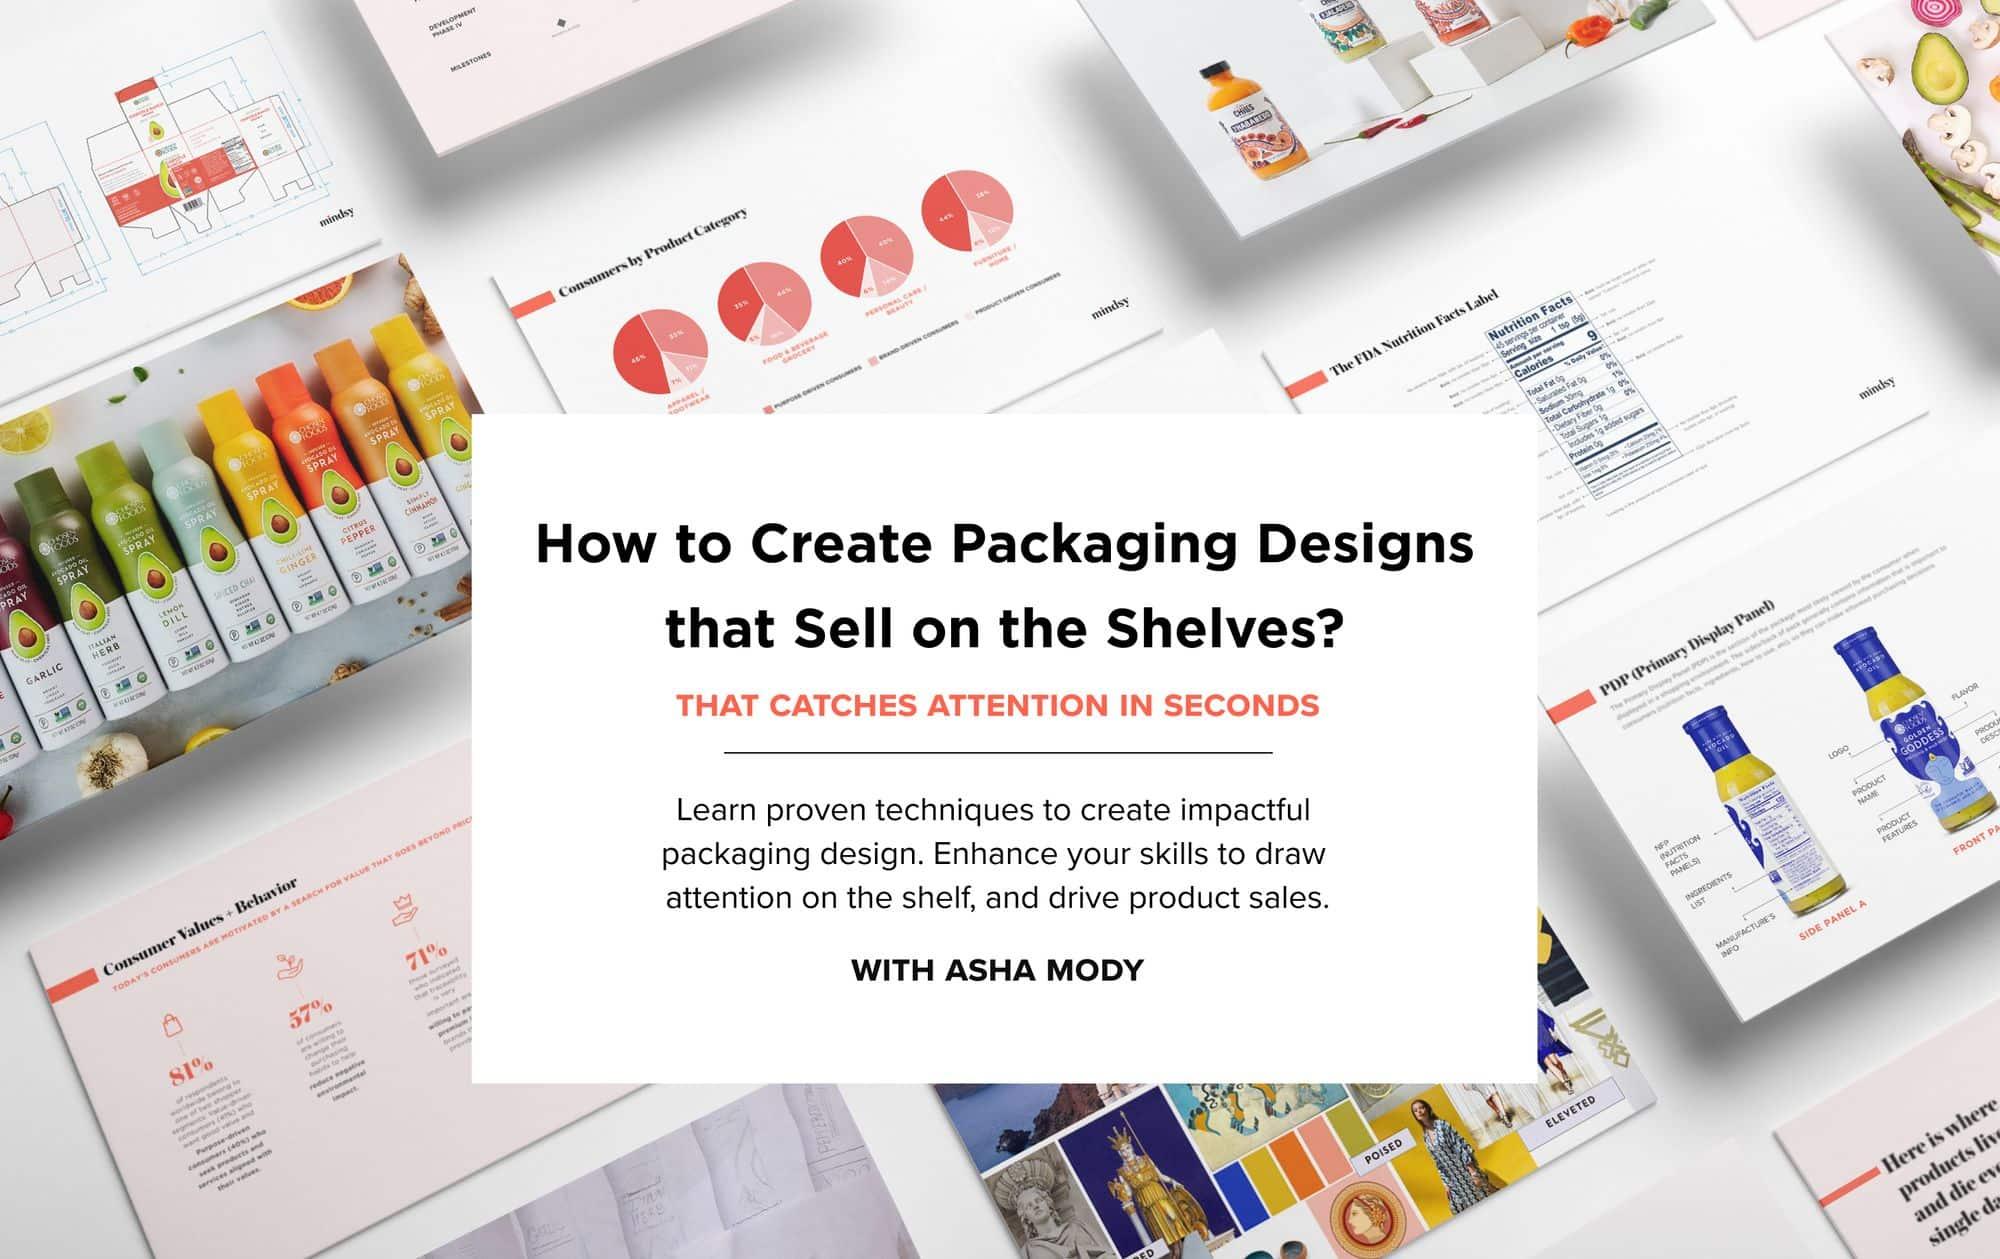 Best Packaging Design Course Online